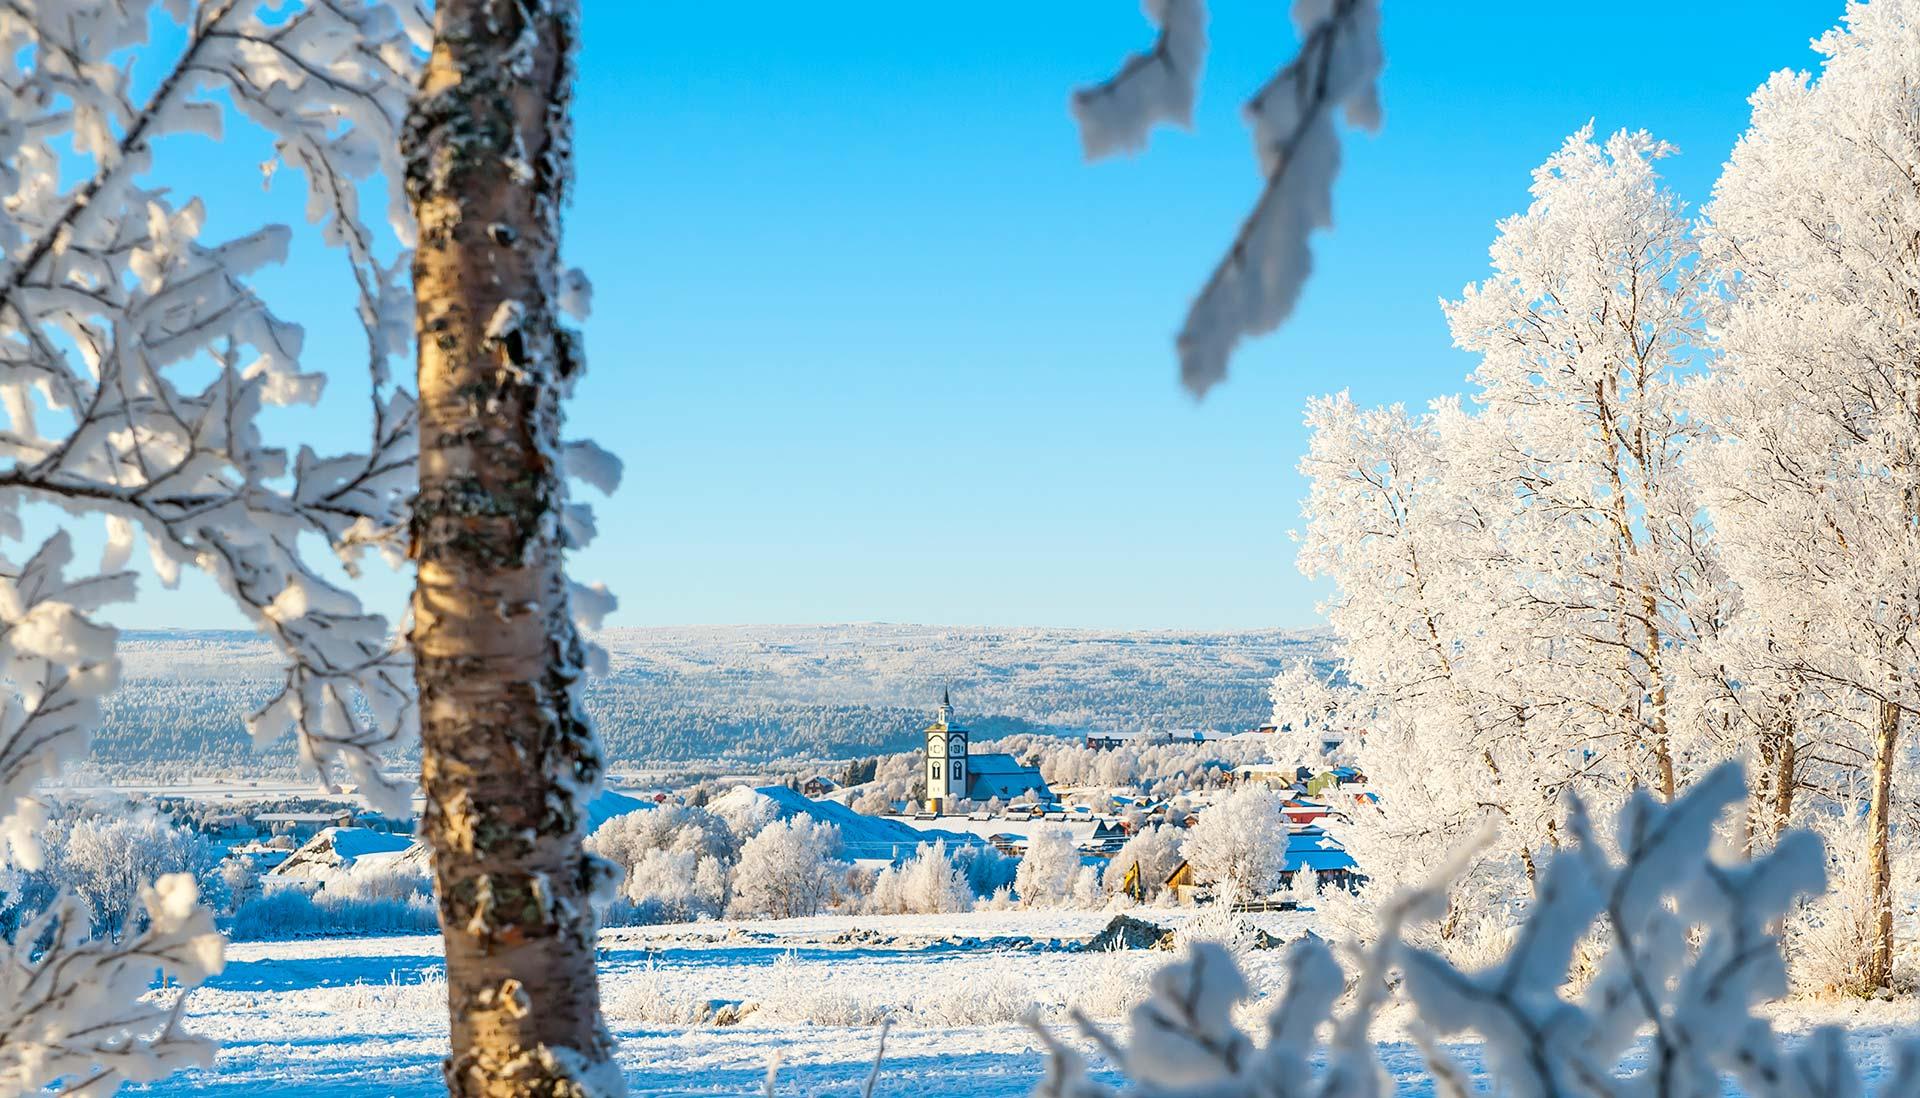 winter landscape image of Roros, Norway